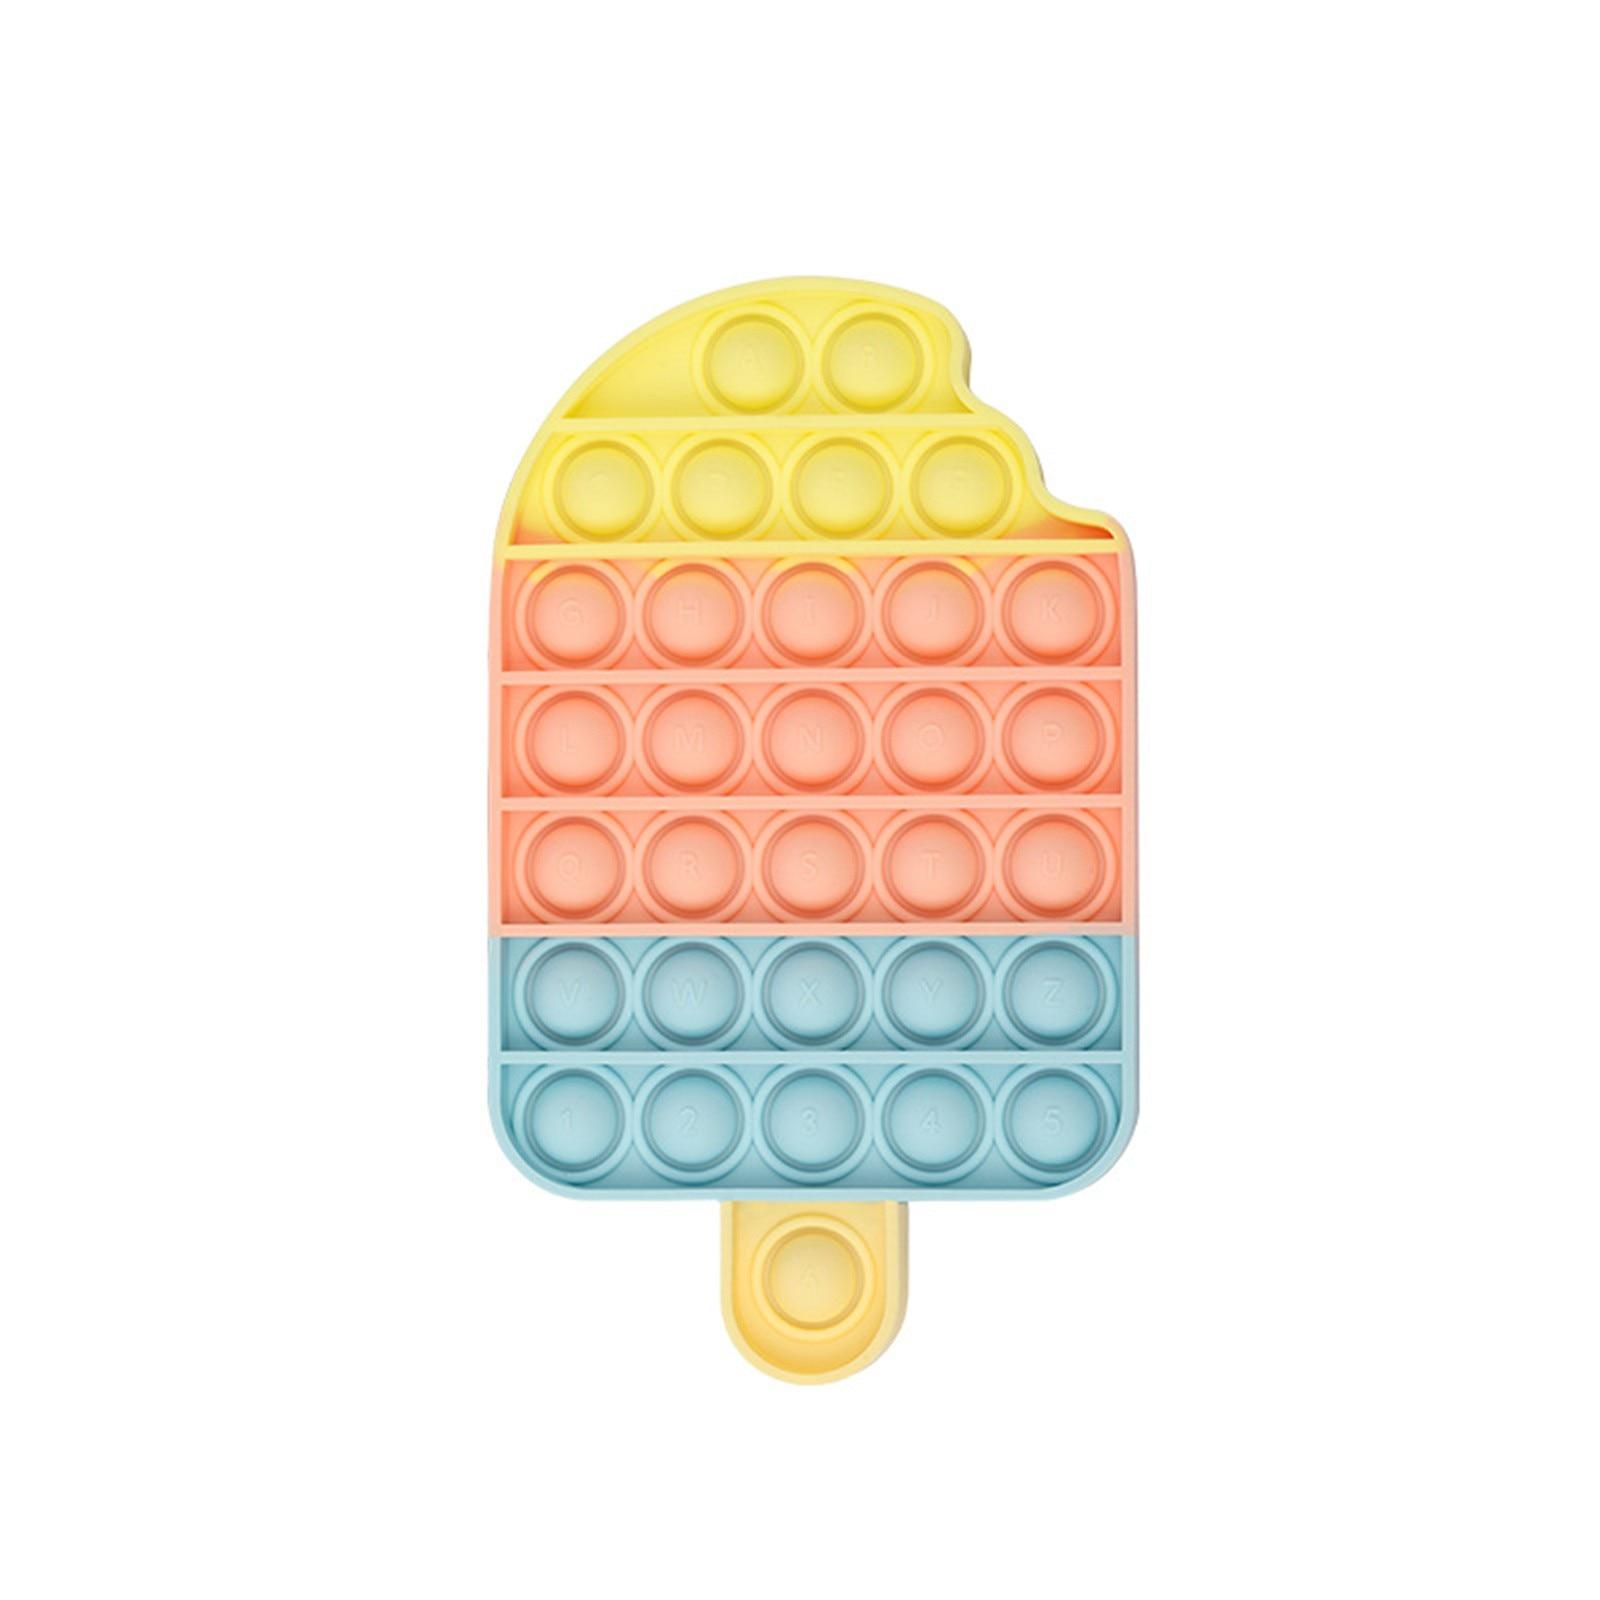 Sensory Toy Stress-Toy Reliver Pops Fidget Rainbow-Push Children Adult It img4